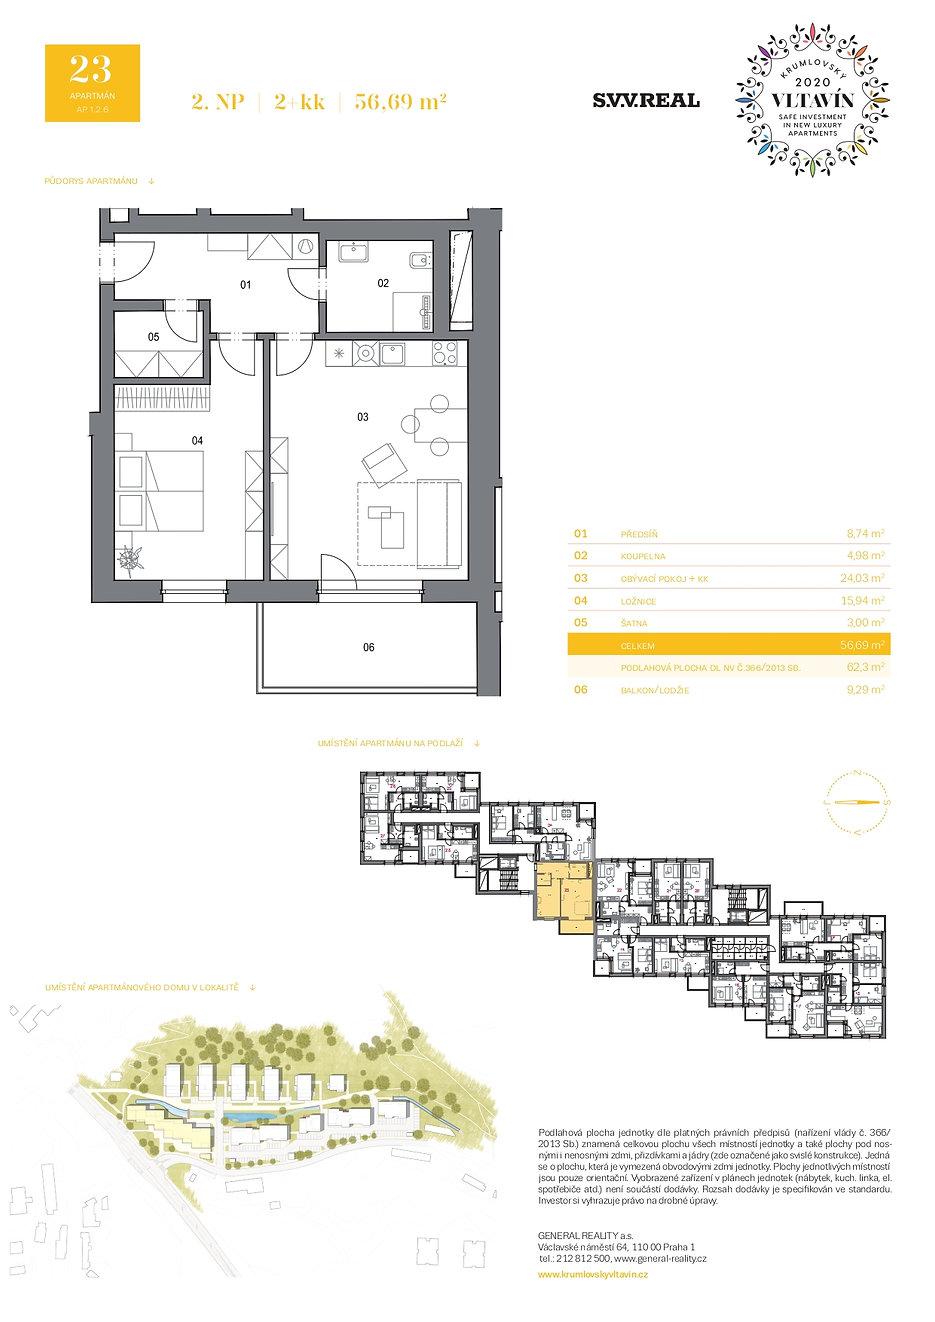 GR_krumlovsky-vltavin_bytove-karty-apartmany_2NP_A23_page-0001.jpg